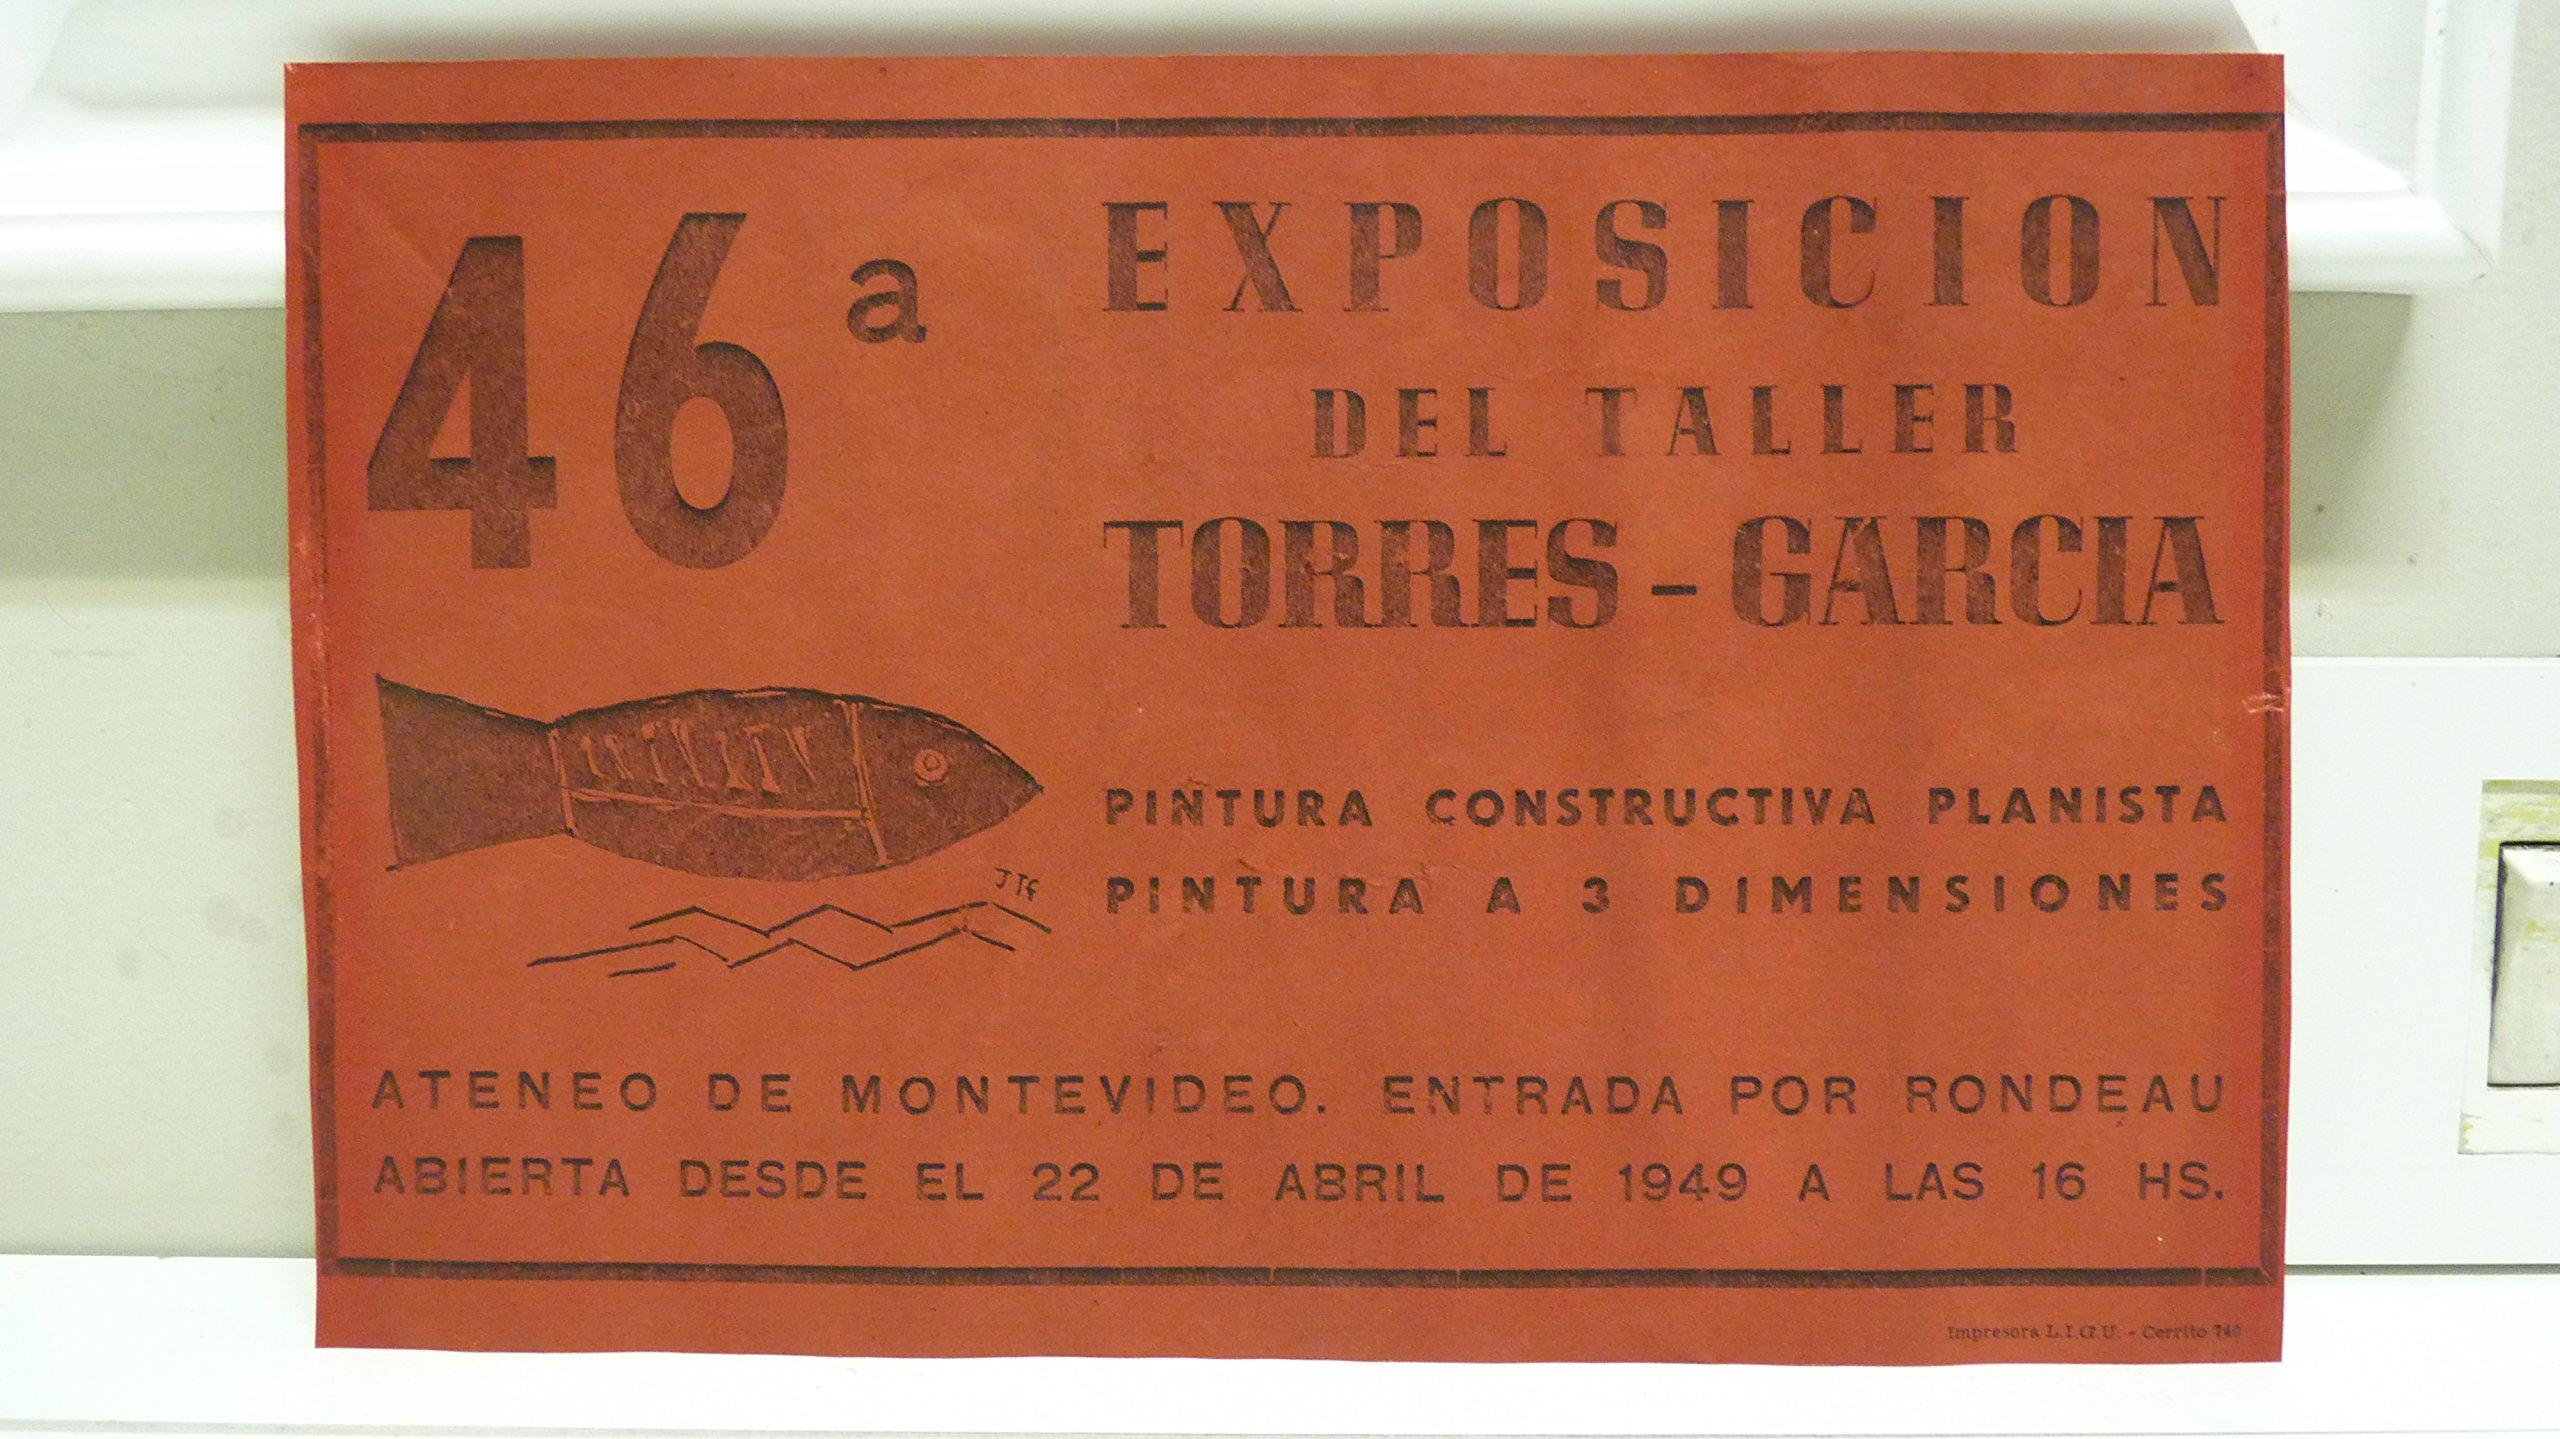 Cartel: 46a Exposición del Taller Torres - García. Pintura ...